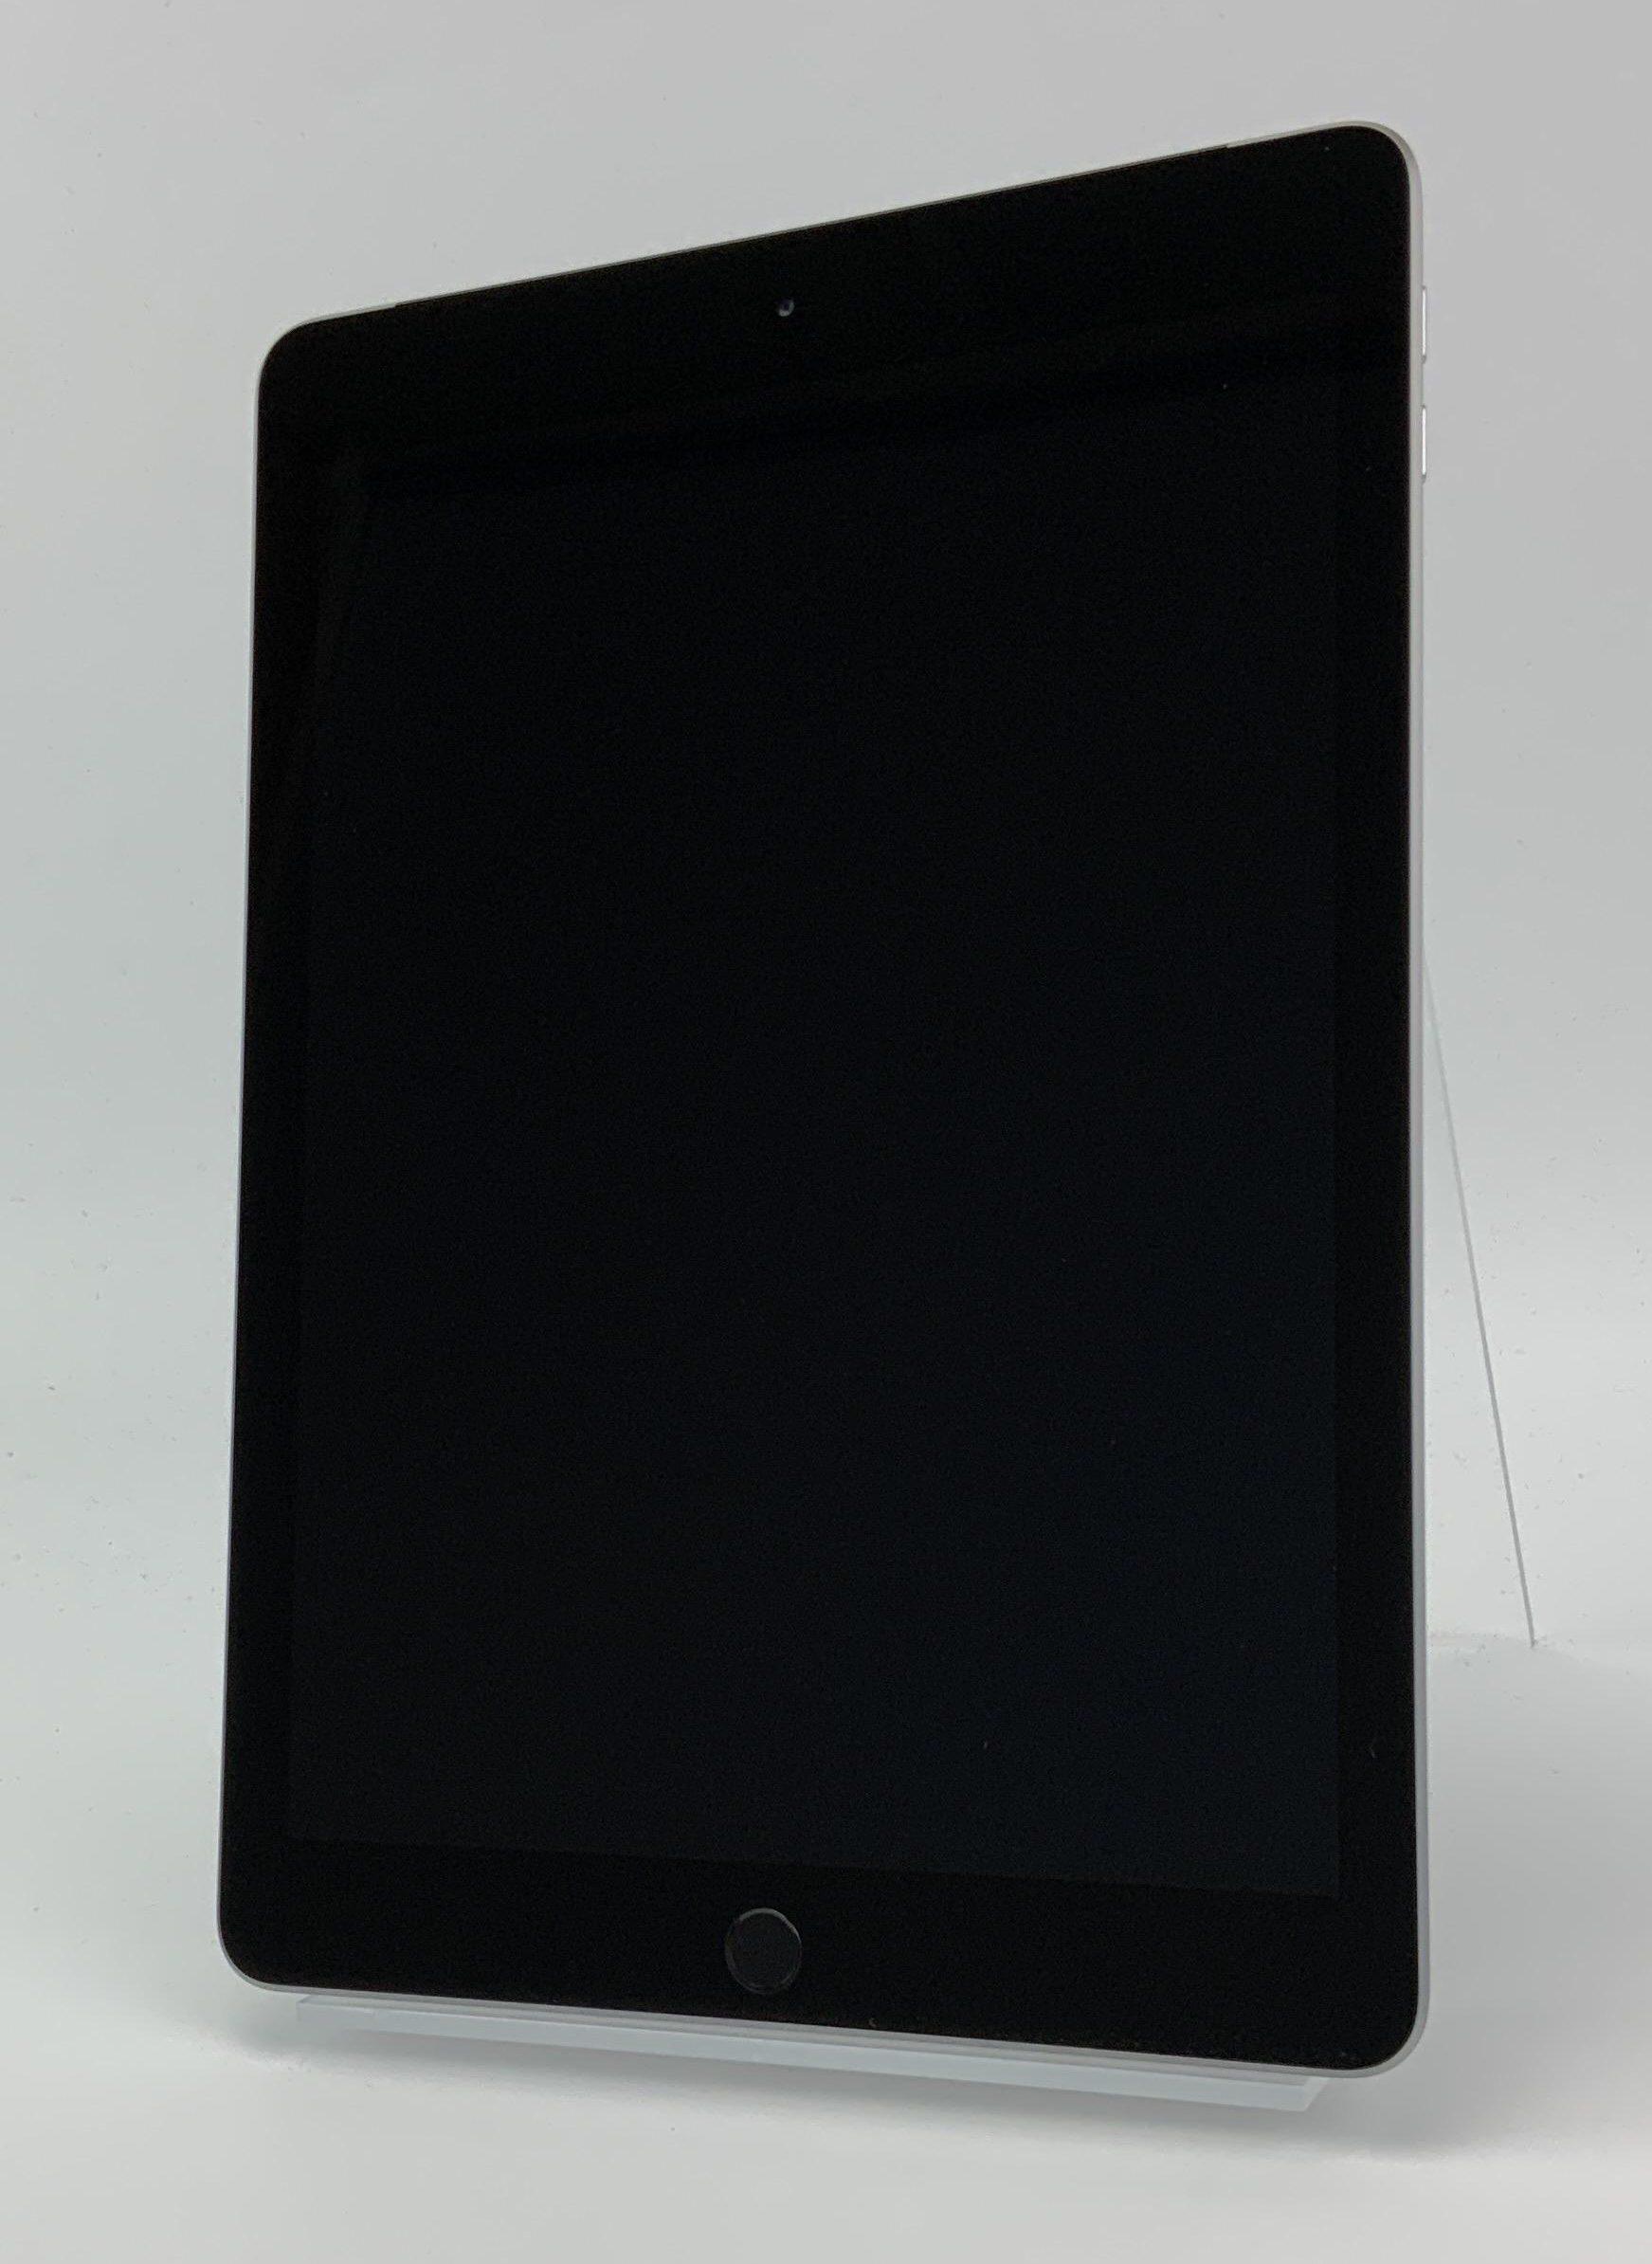 iPad 6 Wi-Fi + Cellular 128GB, 128GB, Space Gray, Kuva 1